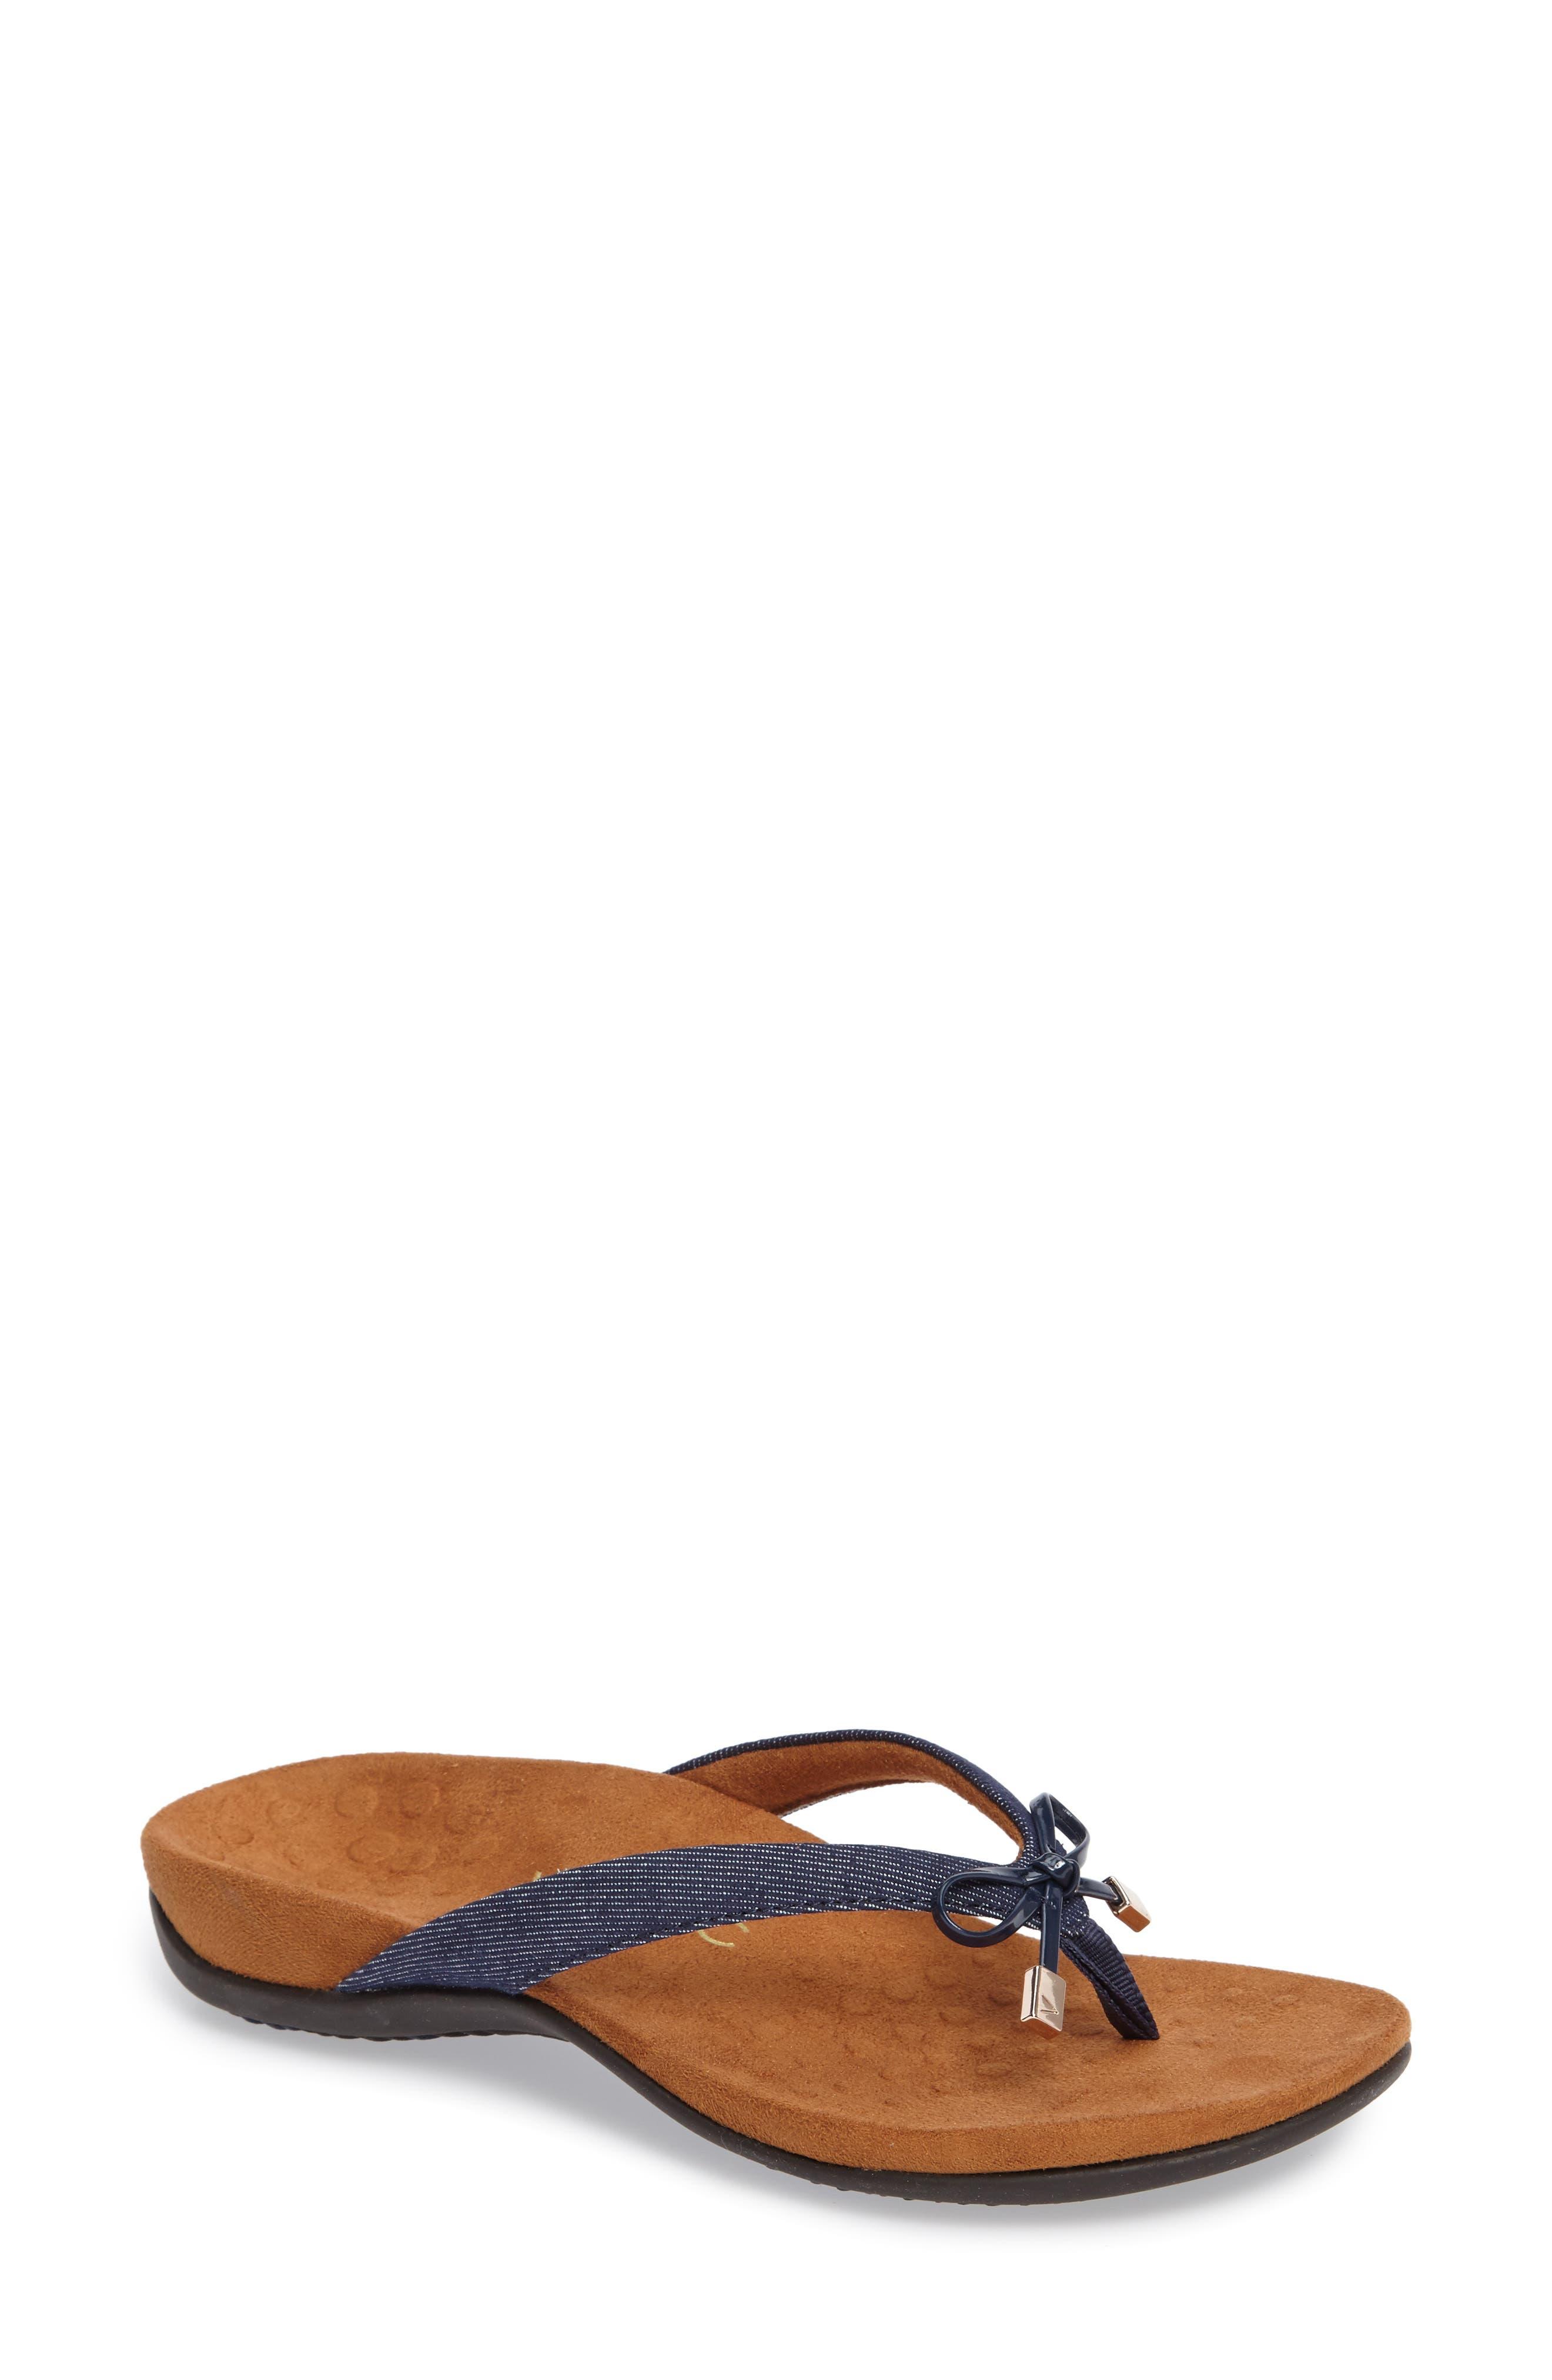 df07525c056b Vionic Sandals - Women s